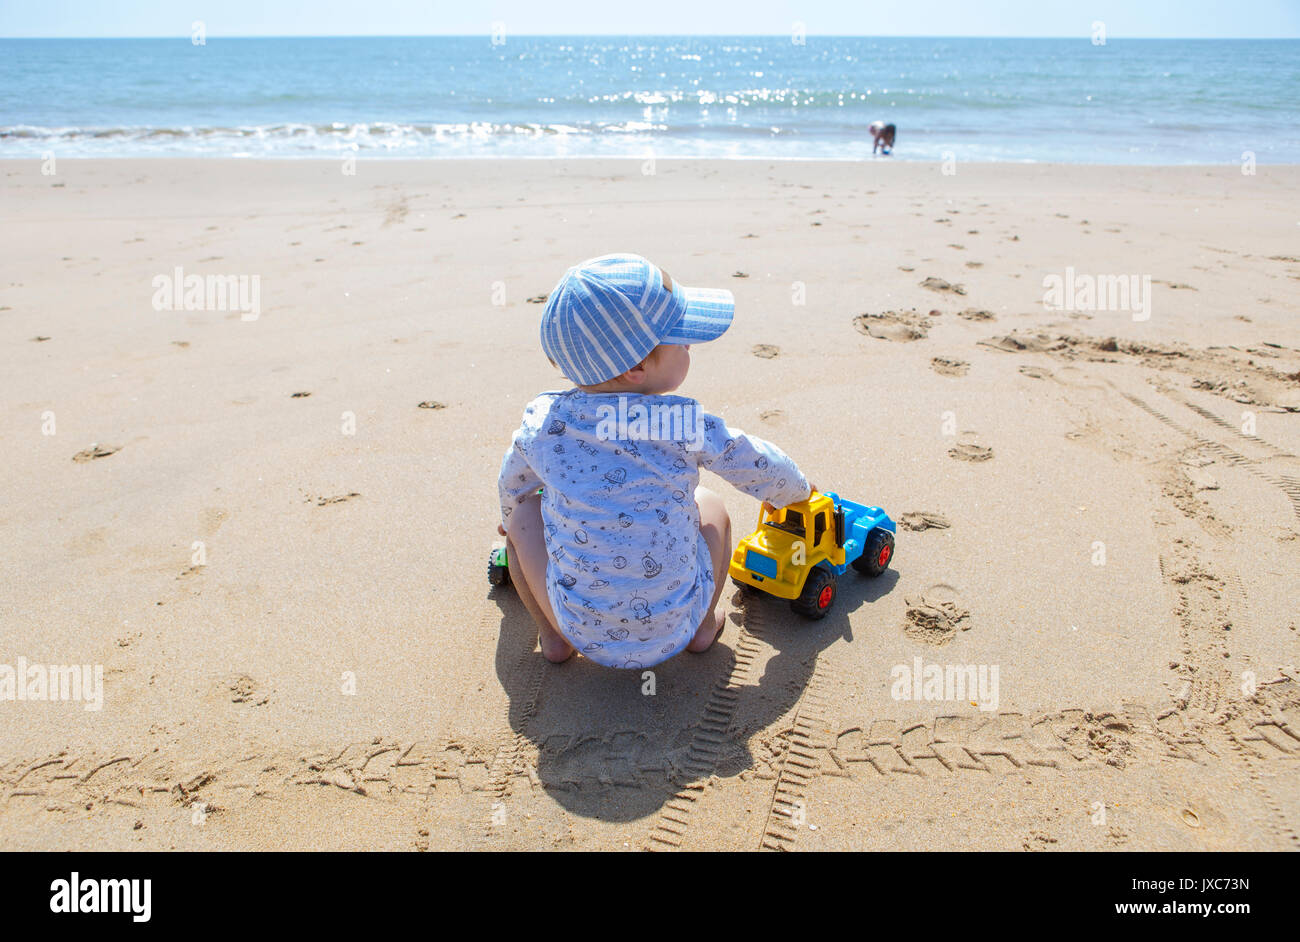 Baby boy playing on the sand while his sister run beside beach shore. El Rompido, Cartaya, Huelva, Spain - Stock Image